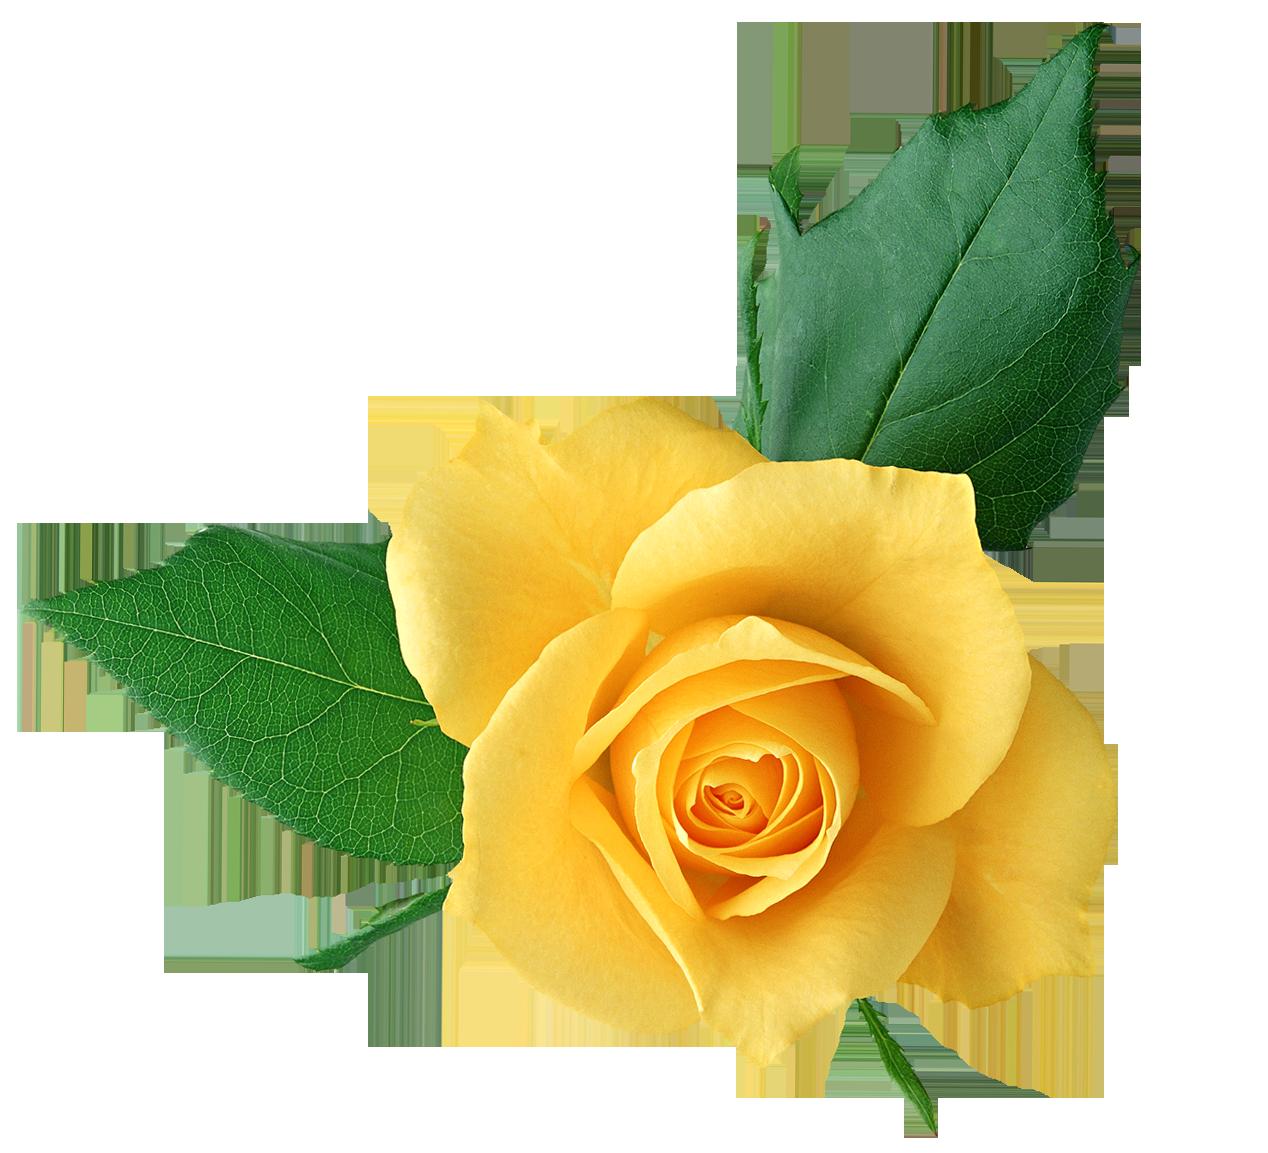 Transparent flower rose yellow clipart jpg library download Rose Yellow Flower Clip art - yellow rose png download ... jpg library download